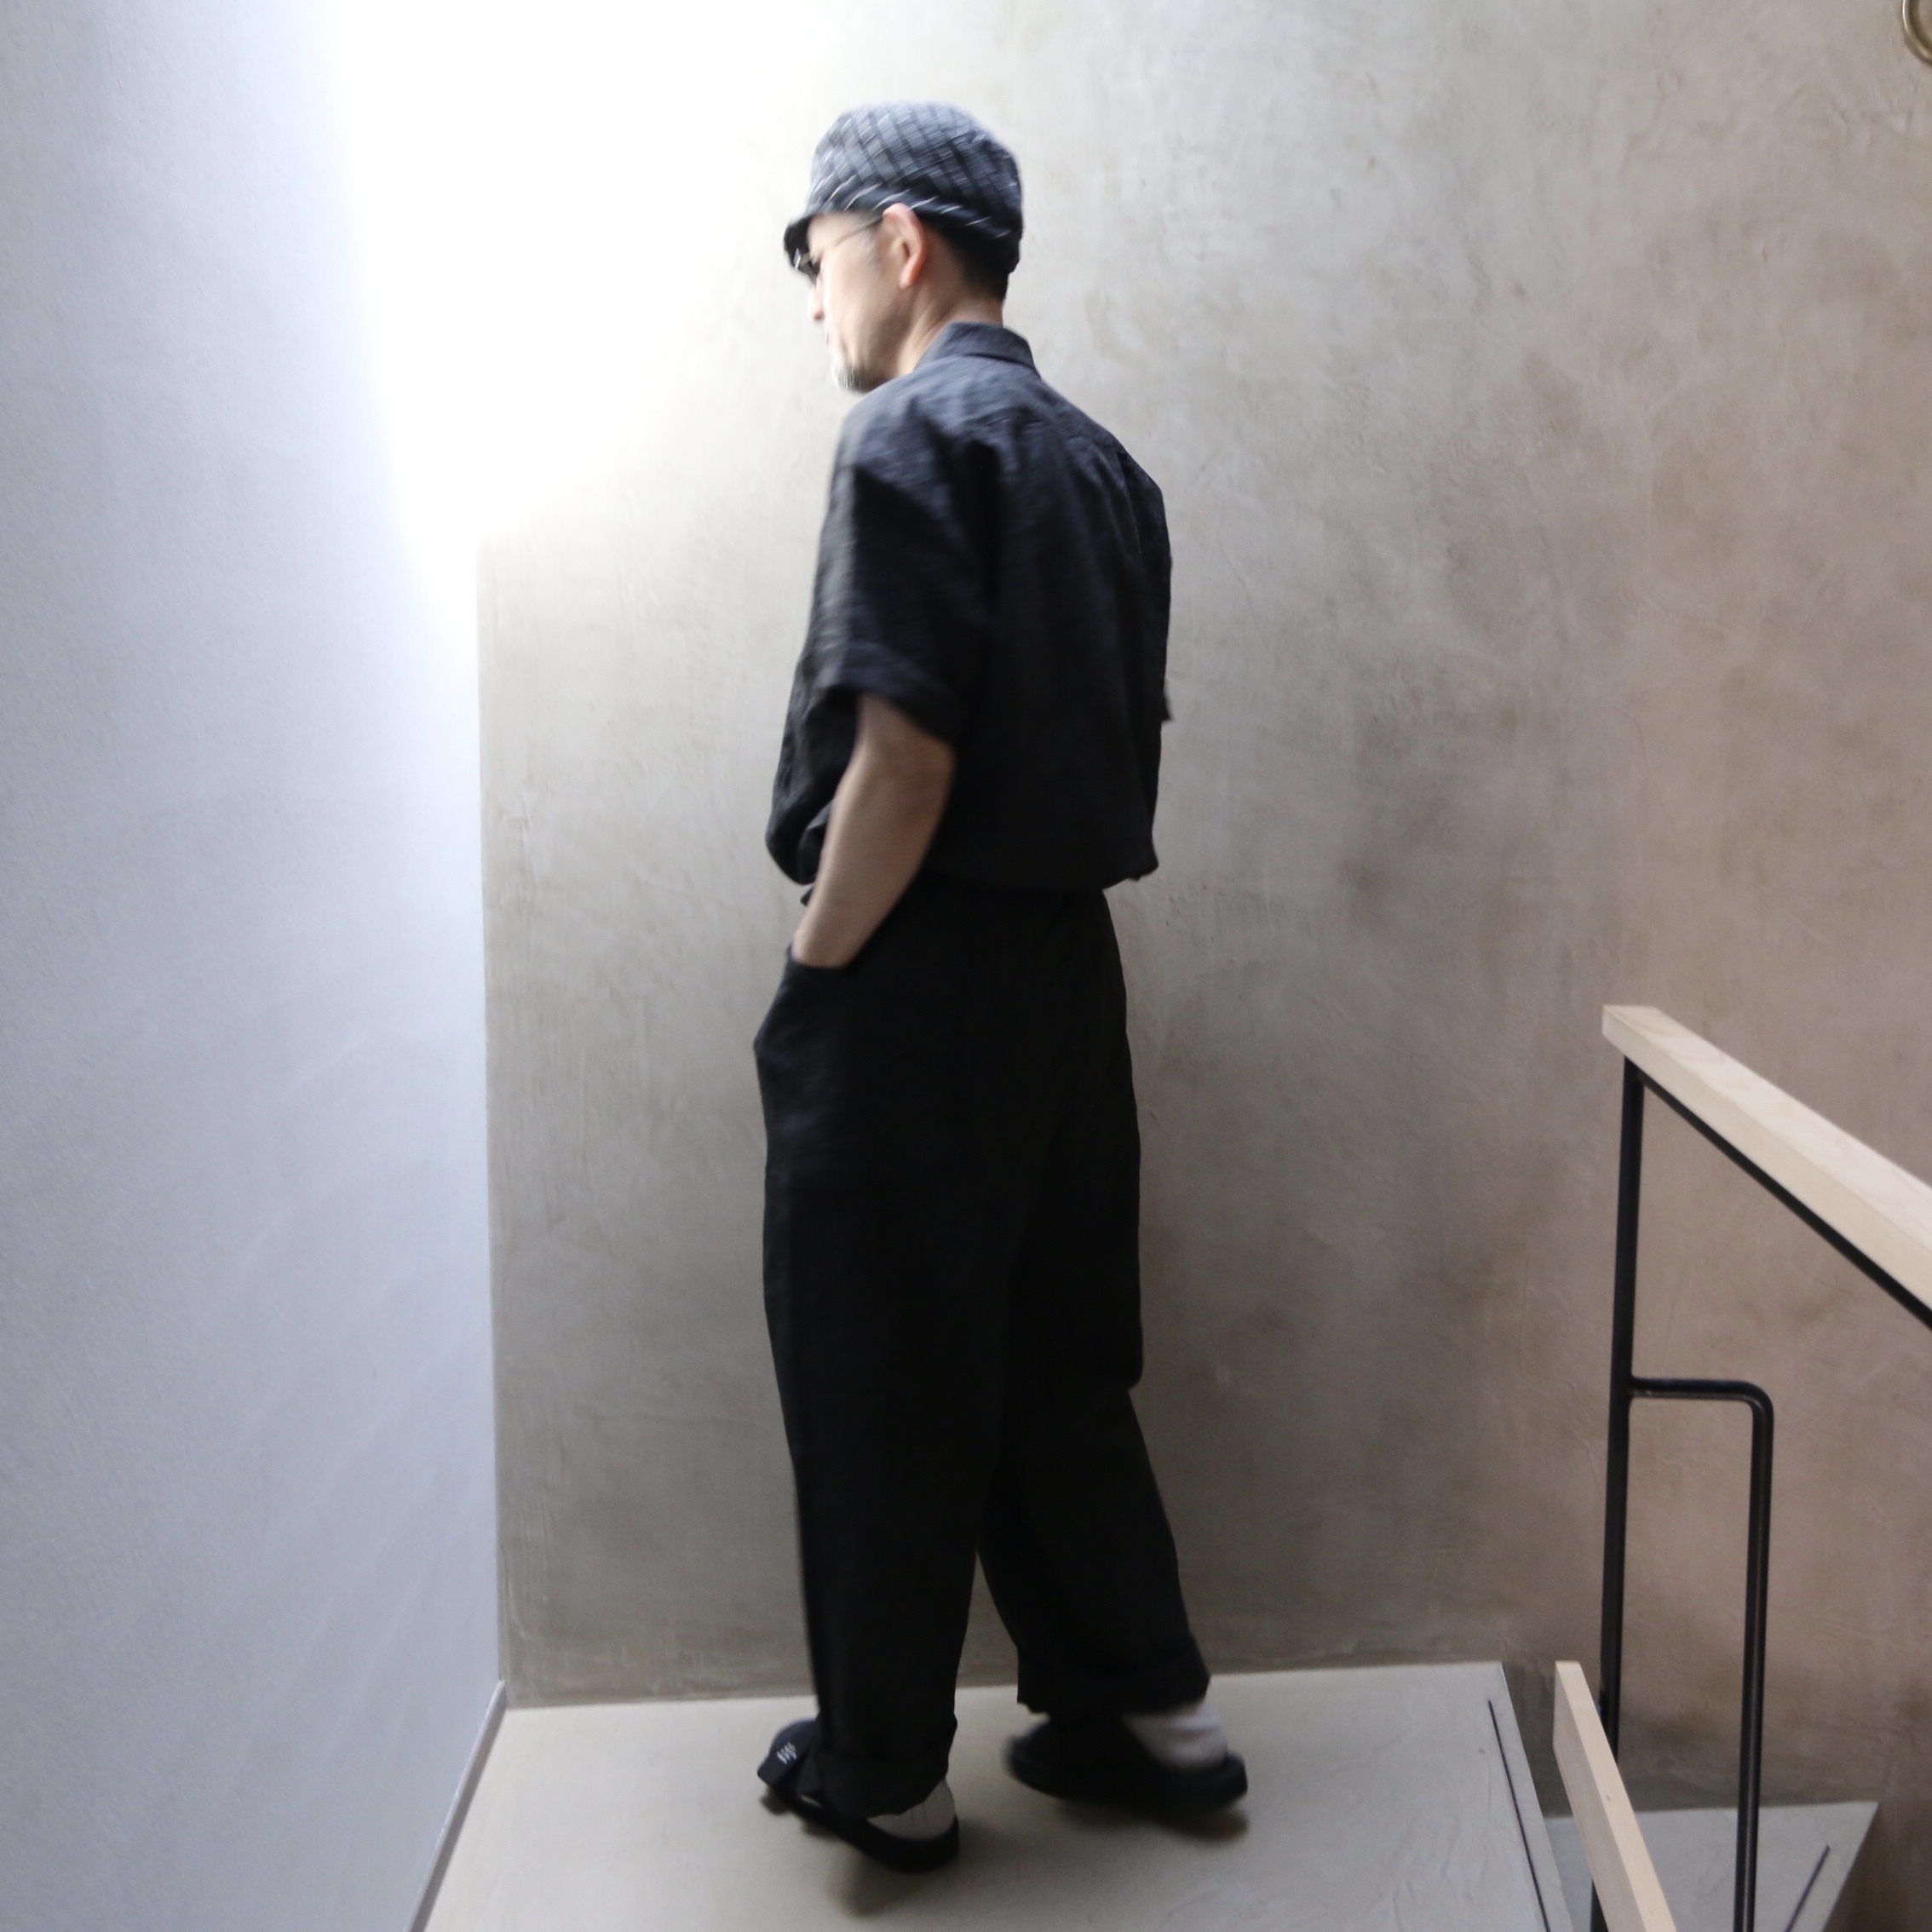 ASEEDONCLOUD/アシードンクラウド Sakurashi Jumpsuite Ash dyeing linen 211301